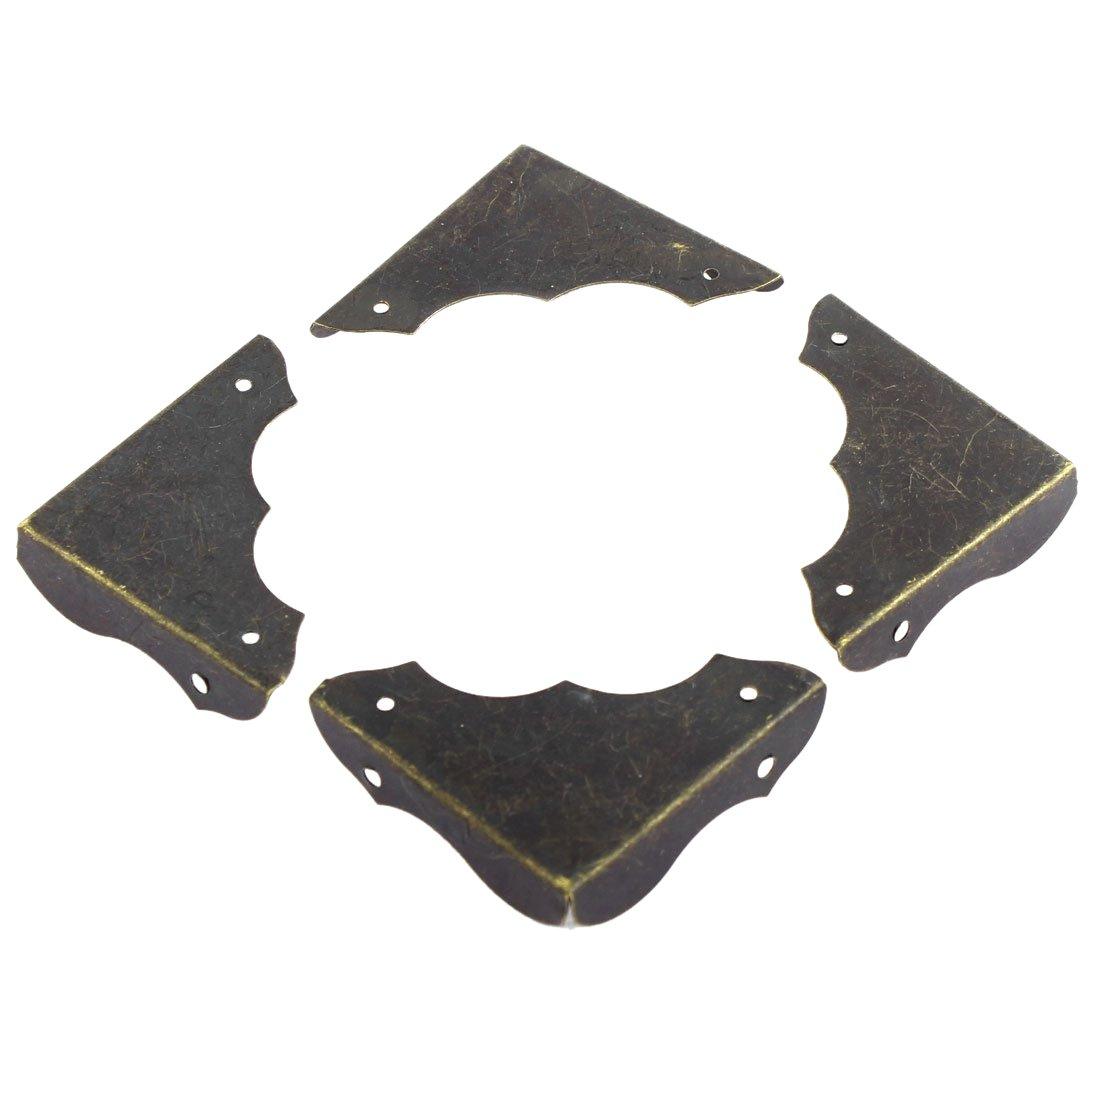 SODIAL(R) Desk Corner Protector Metal Table Retro Style Corner Covers Protector 40mmx40mm 4 Pcs Bronze